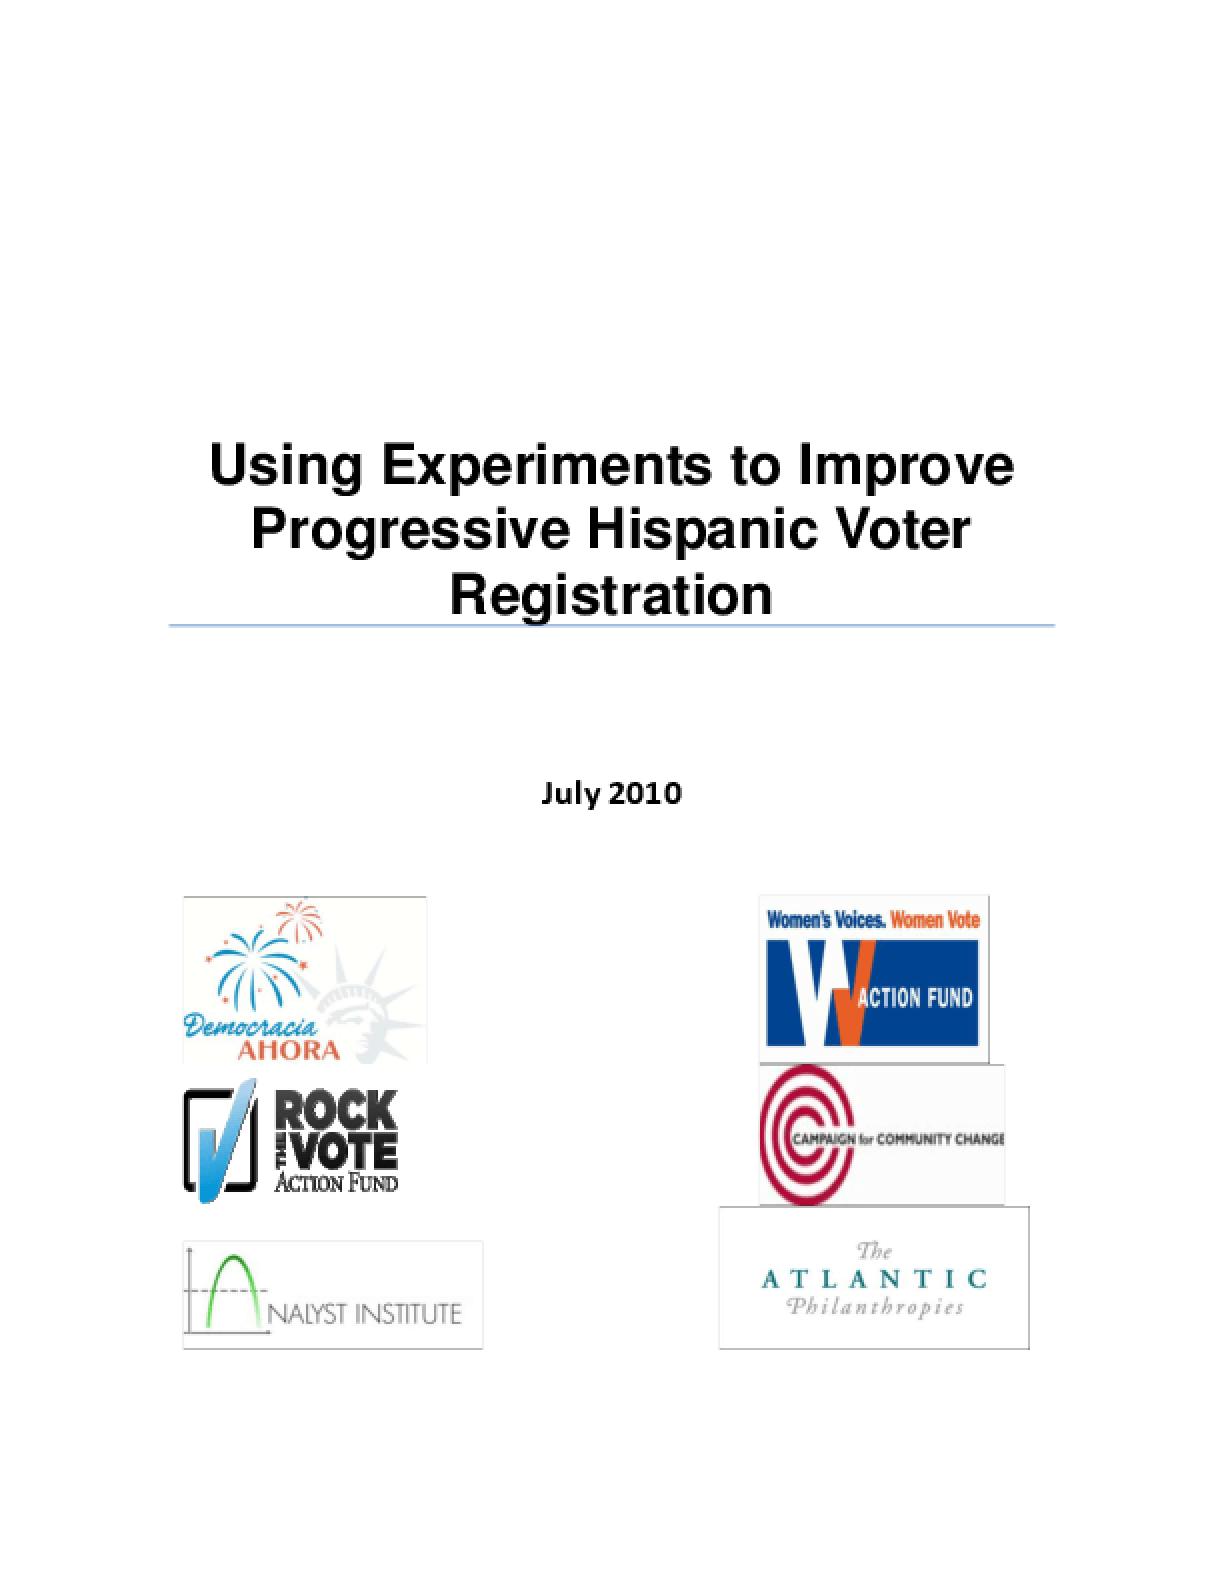 Using Experiments to Improve Progressive Hispanic Voter Registration